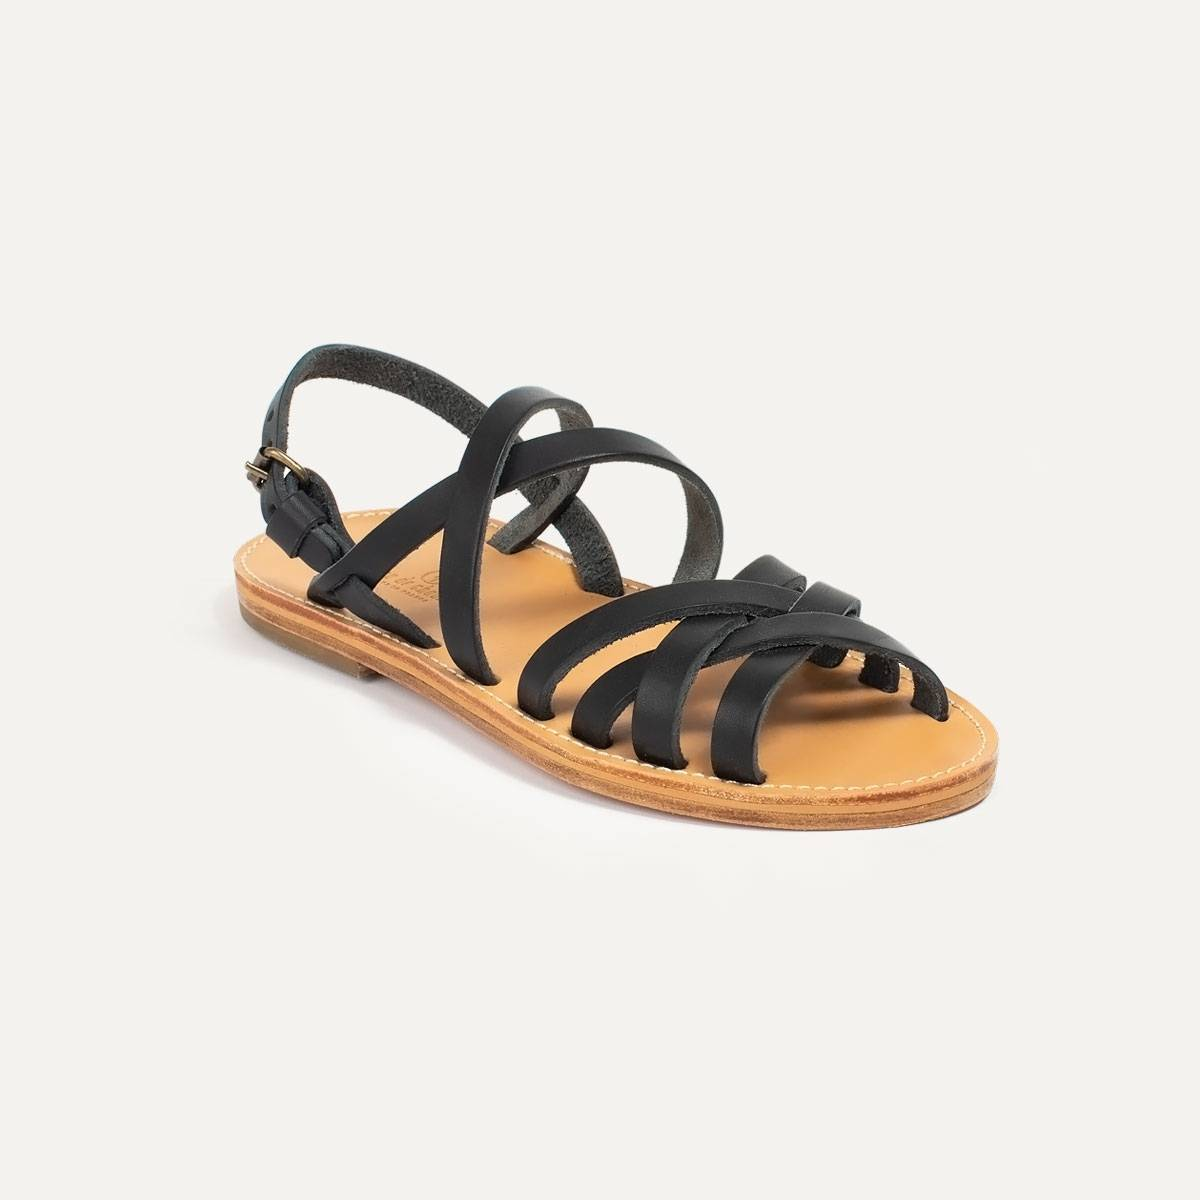 Majour leather sandals - Black (image n°2)